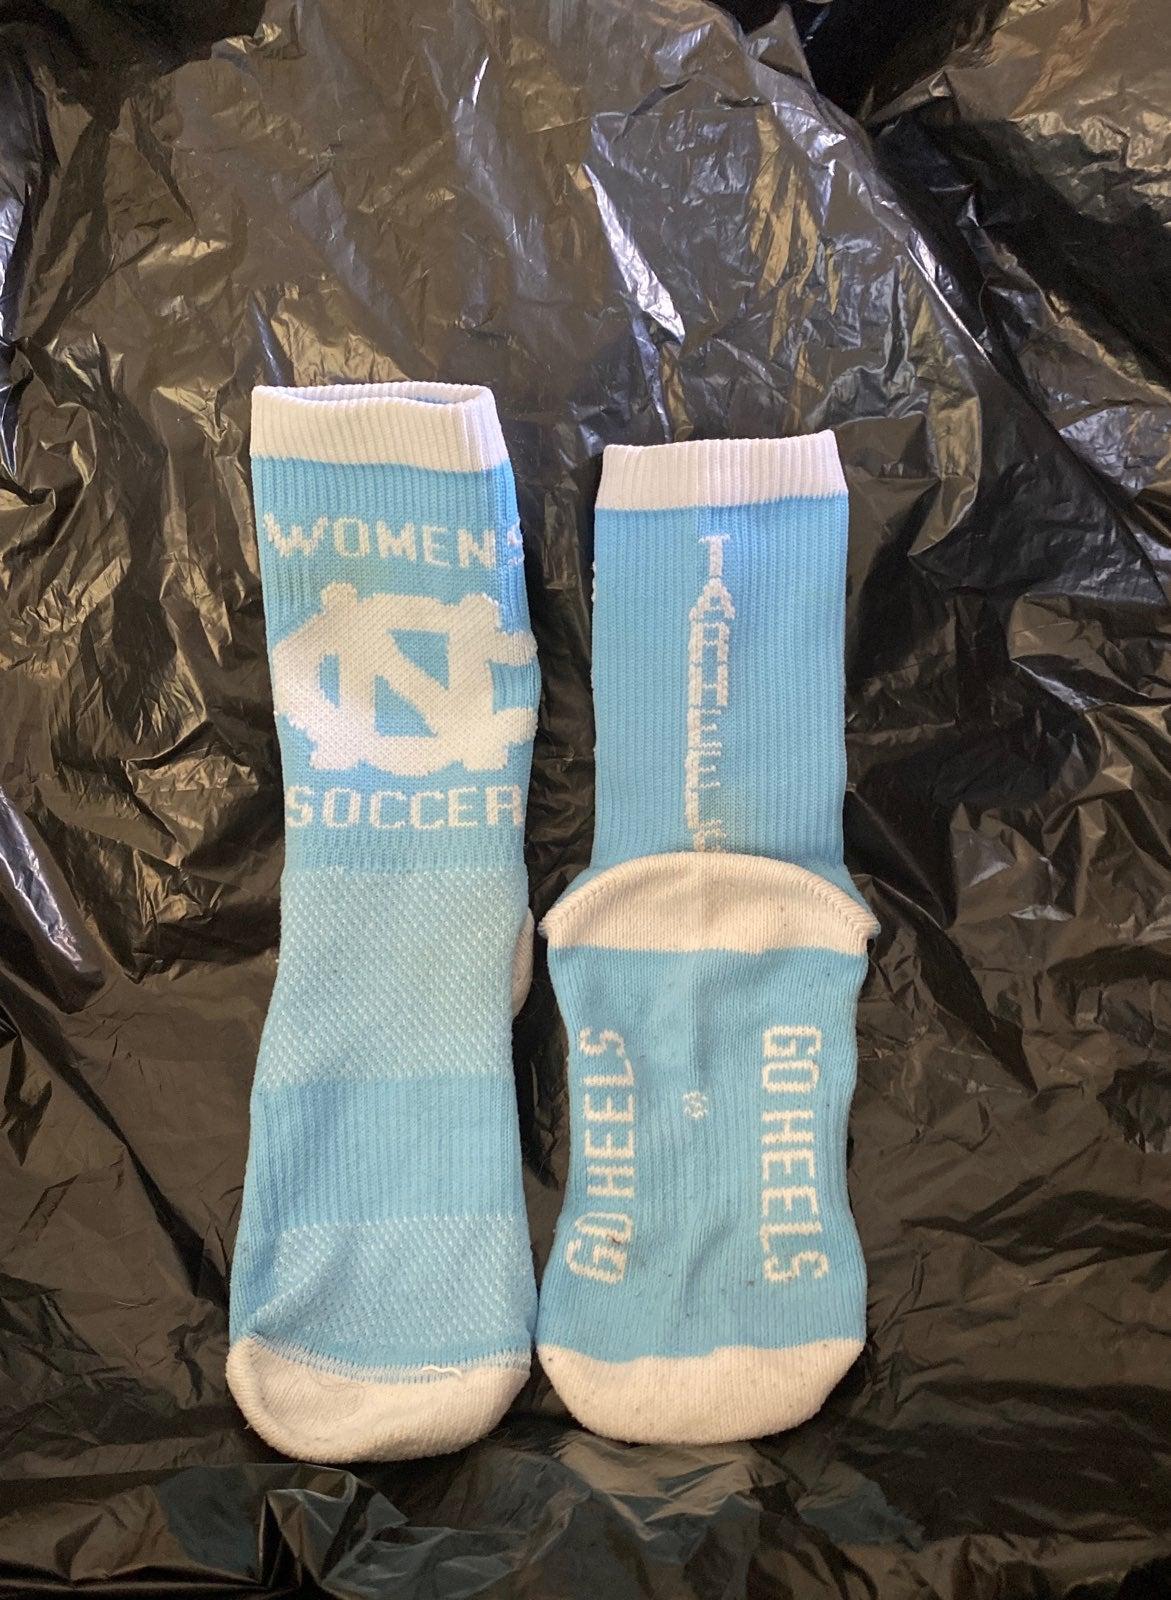 Unc chapel hill crew socks